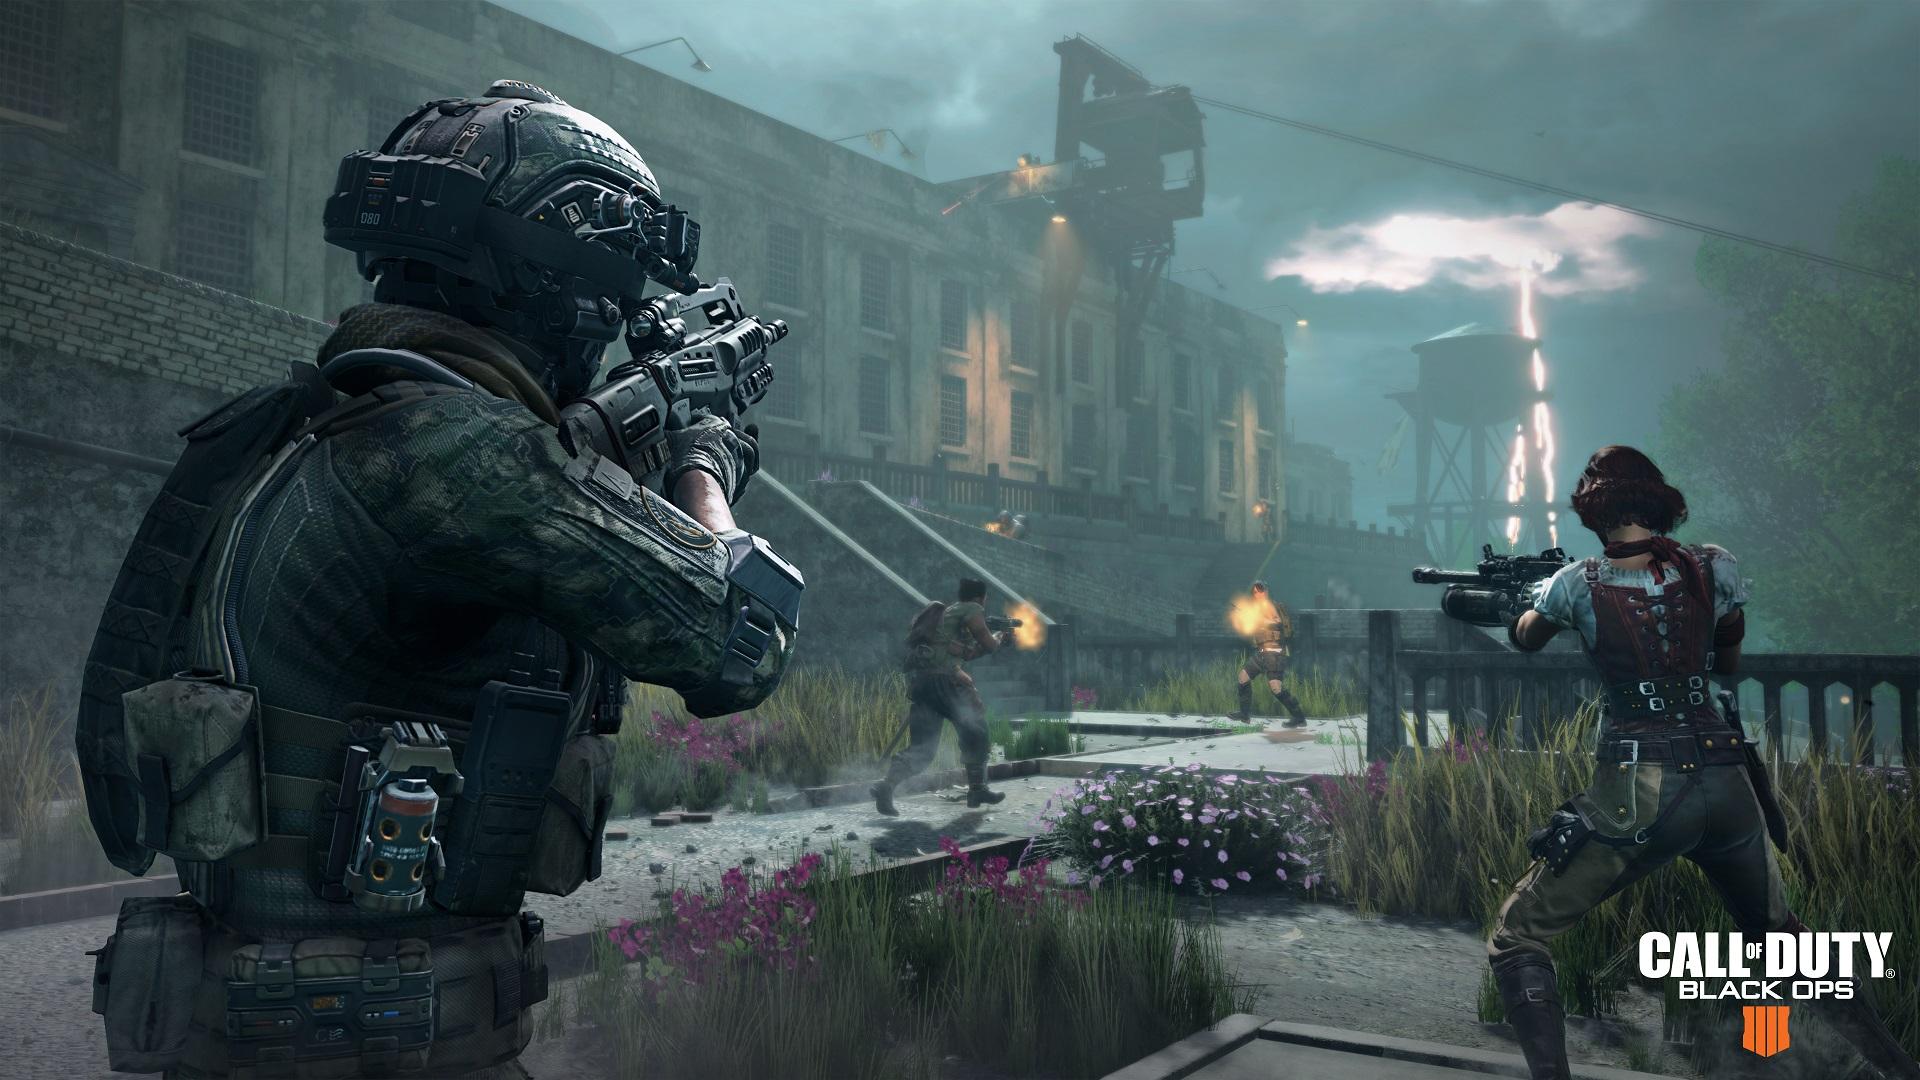 New Call Of Duty 2020.Treyarch Takes Over Call Of Duty 2020 Amid Inter Studio Turmoil